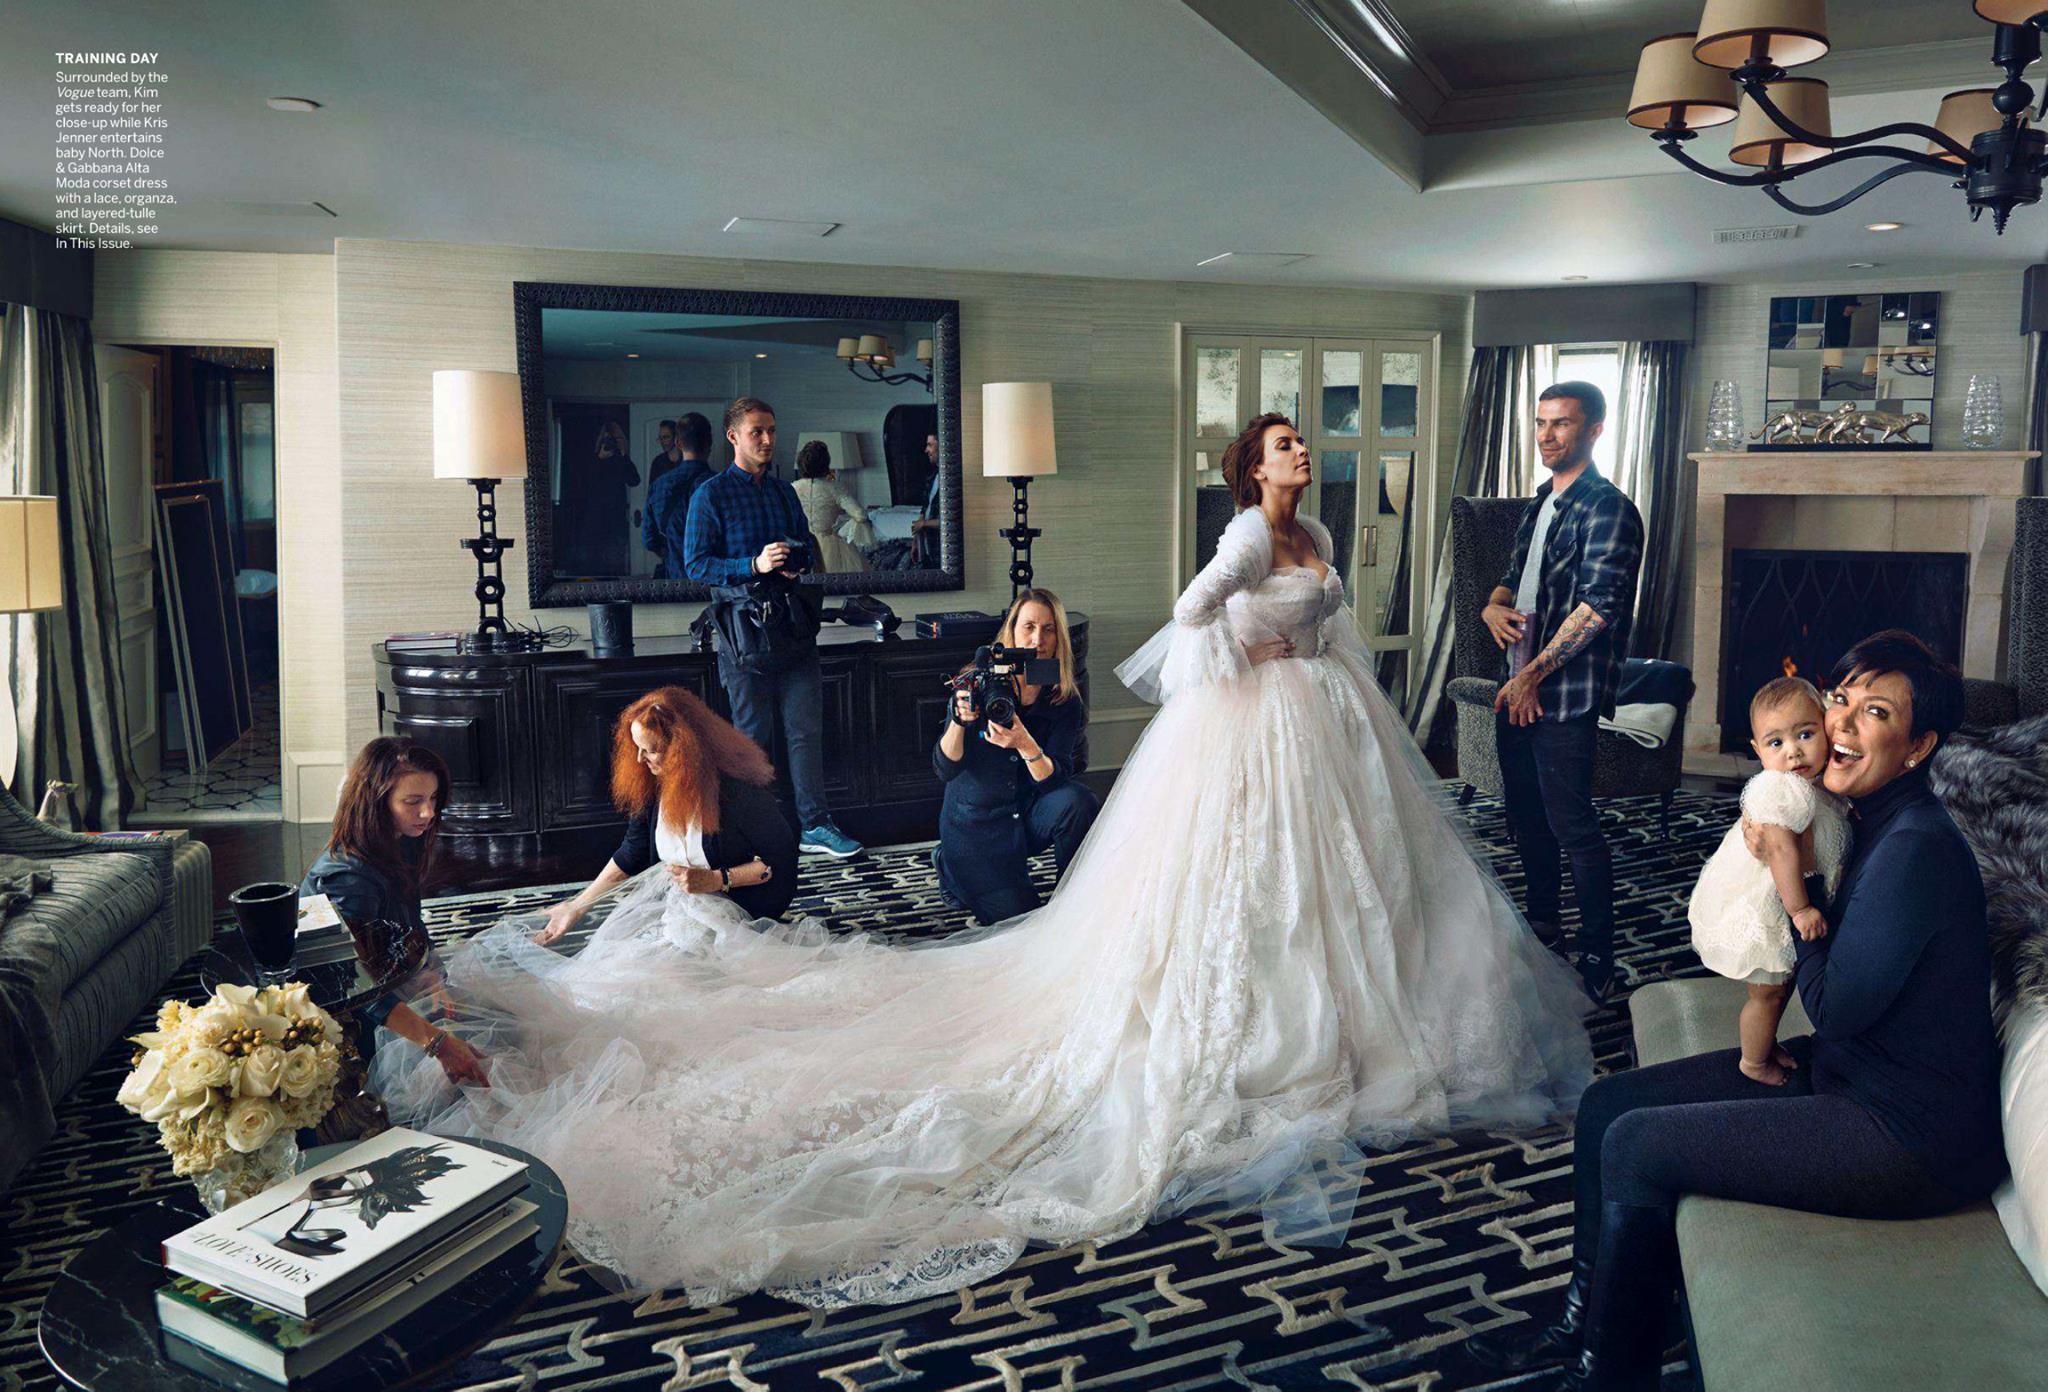 Pin By Nuttwarinthorn Ch On Gorgeous Wedding Dress Kim Kardashian Wedding Dress Kim Kardashian Dresses Kim Kardashian Vogue